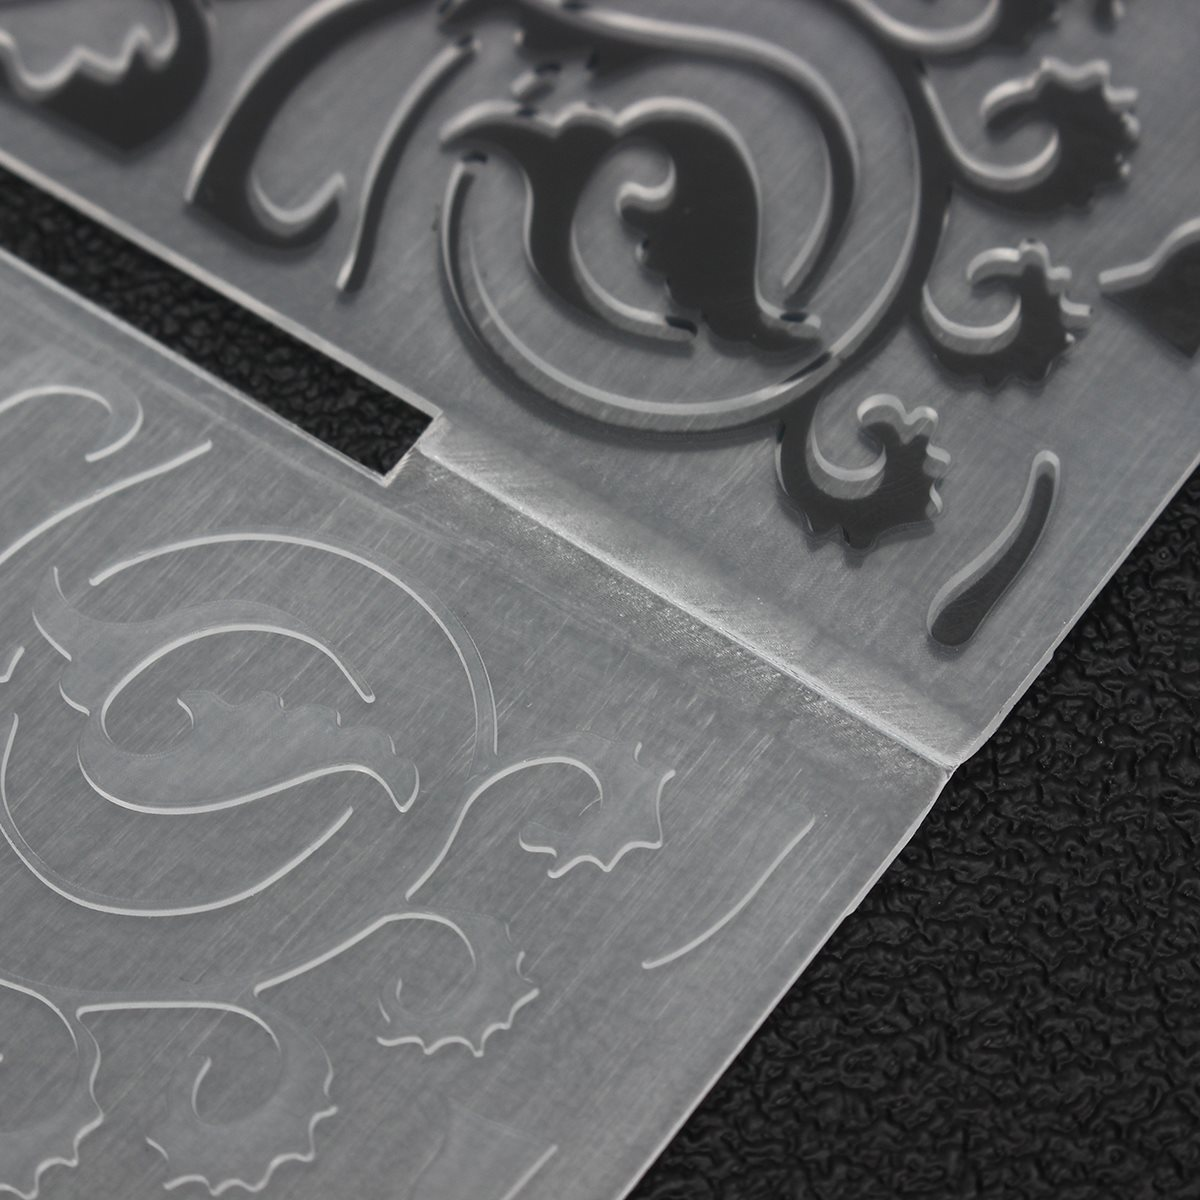 Cake Stencil Biscuit Plastic Embossing Folder DIY Mold Scrapbooking ...